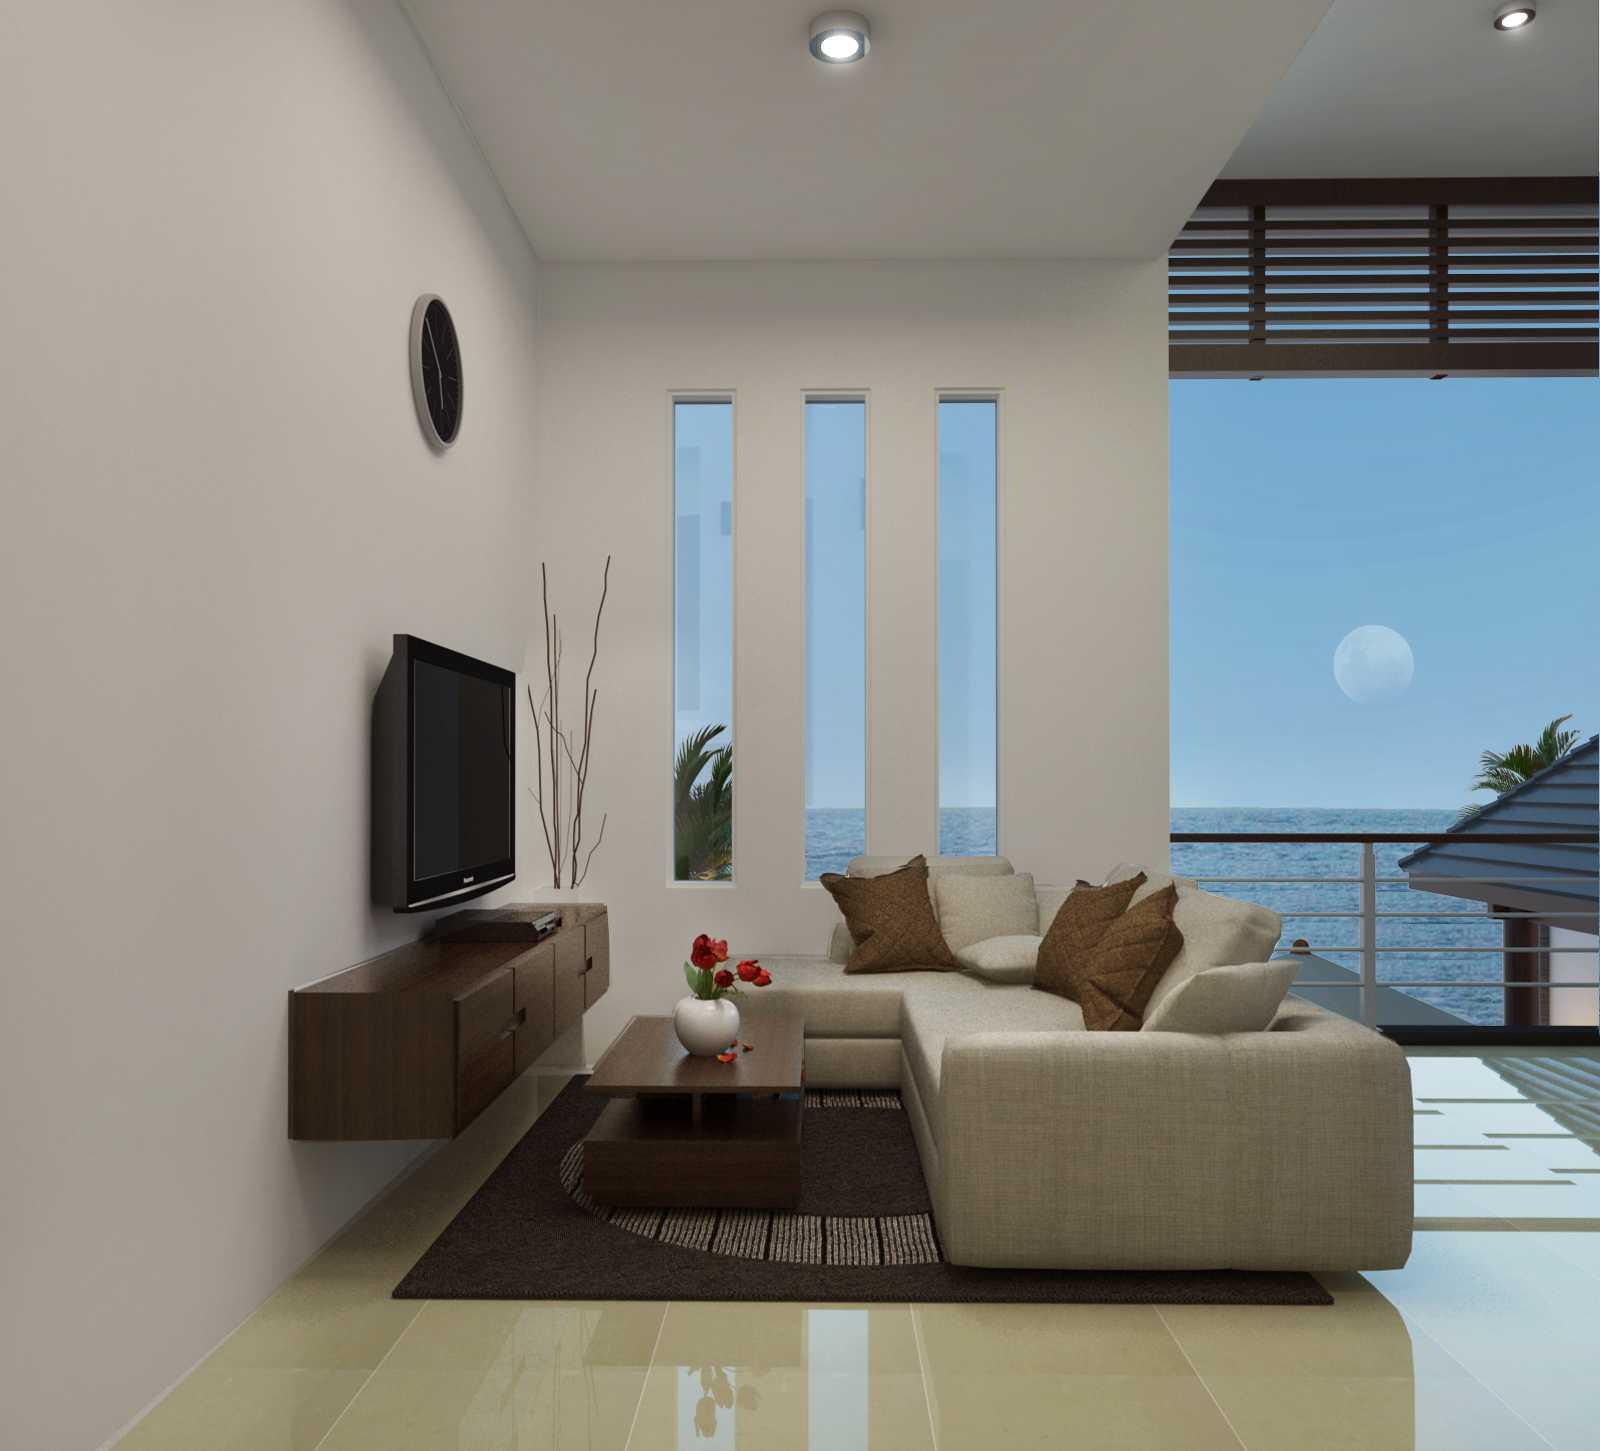 Arsatama Architect Langkung Villa`s - Bali Gianyar, Gianyar Sub-District, Gianyar, Bali, Indonesia Bali, Indonesia Living-Roomlangkung-Villas   23615